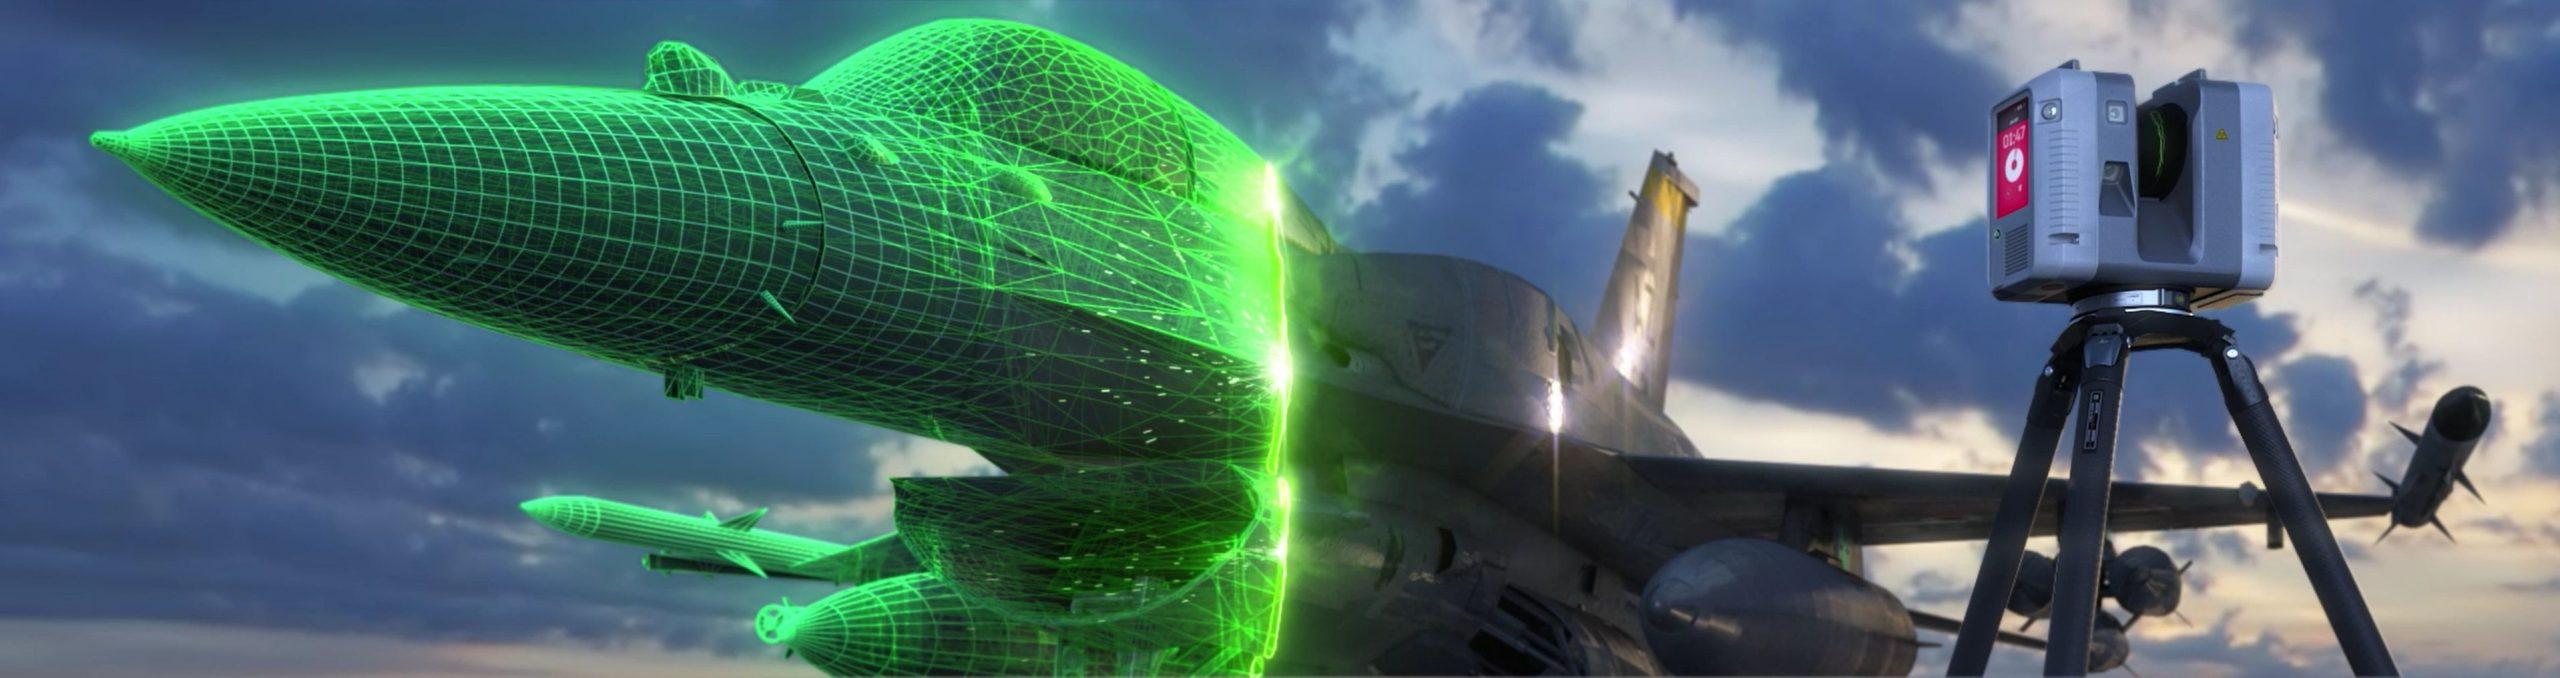 half-digitized 3D rendering of plane